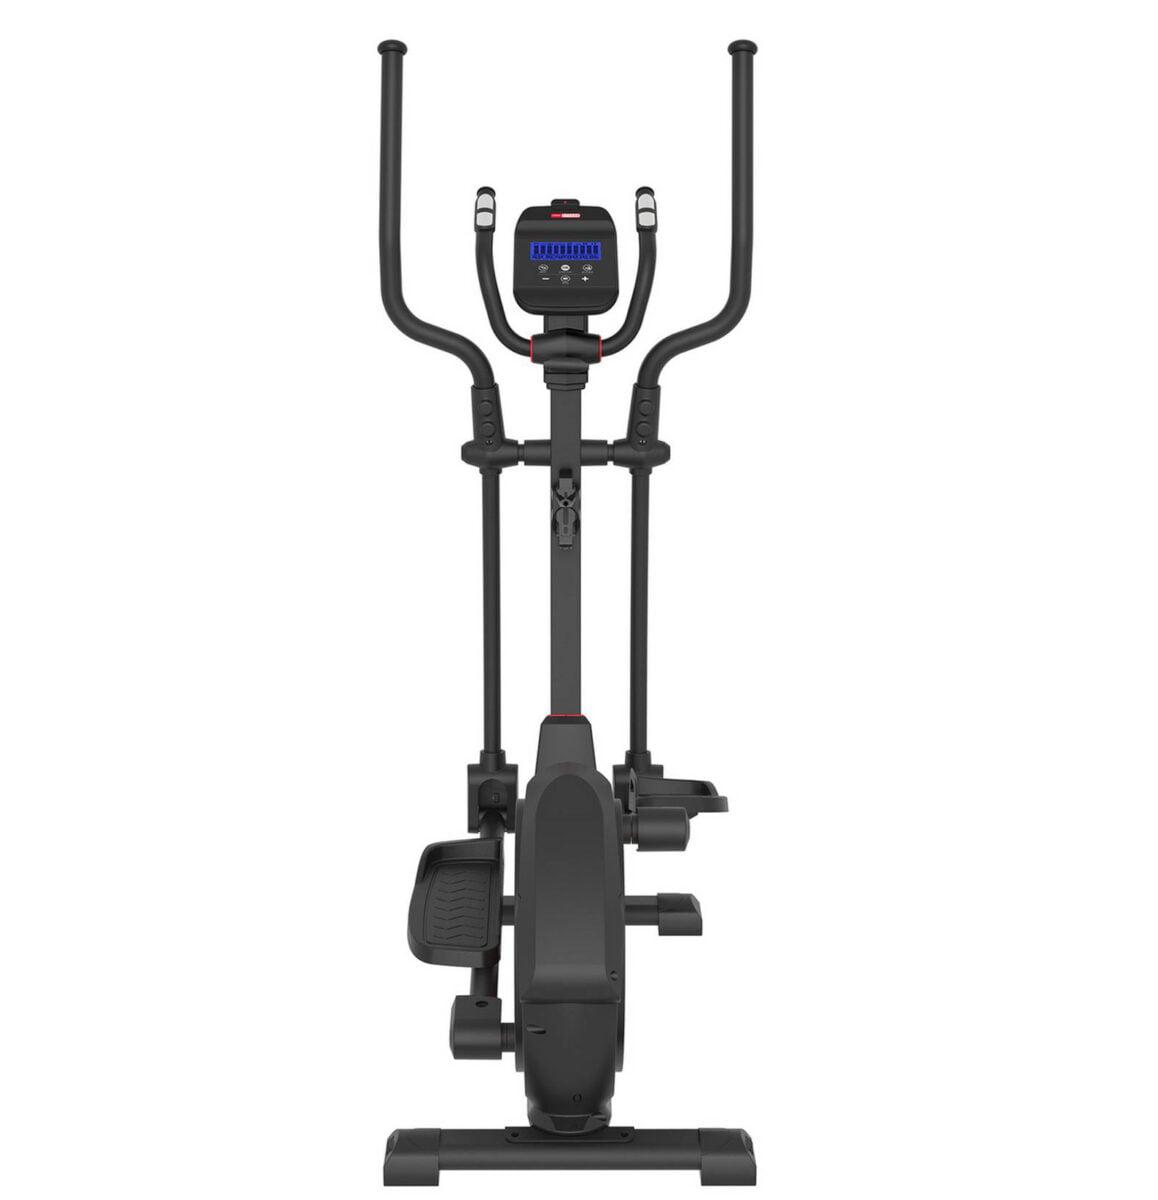 Pro Fitness XT2000 Cross Trainer Rear View